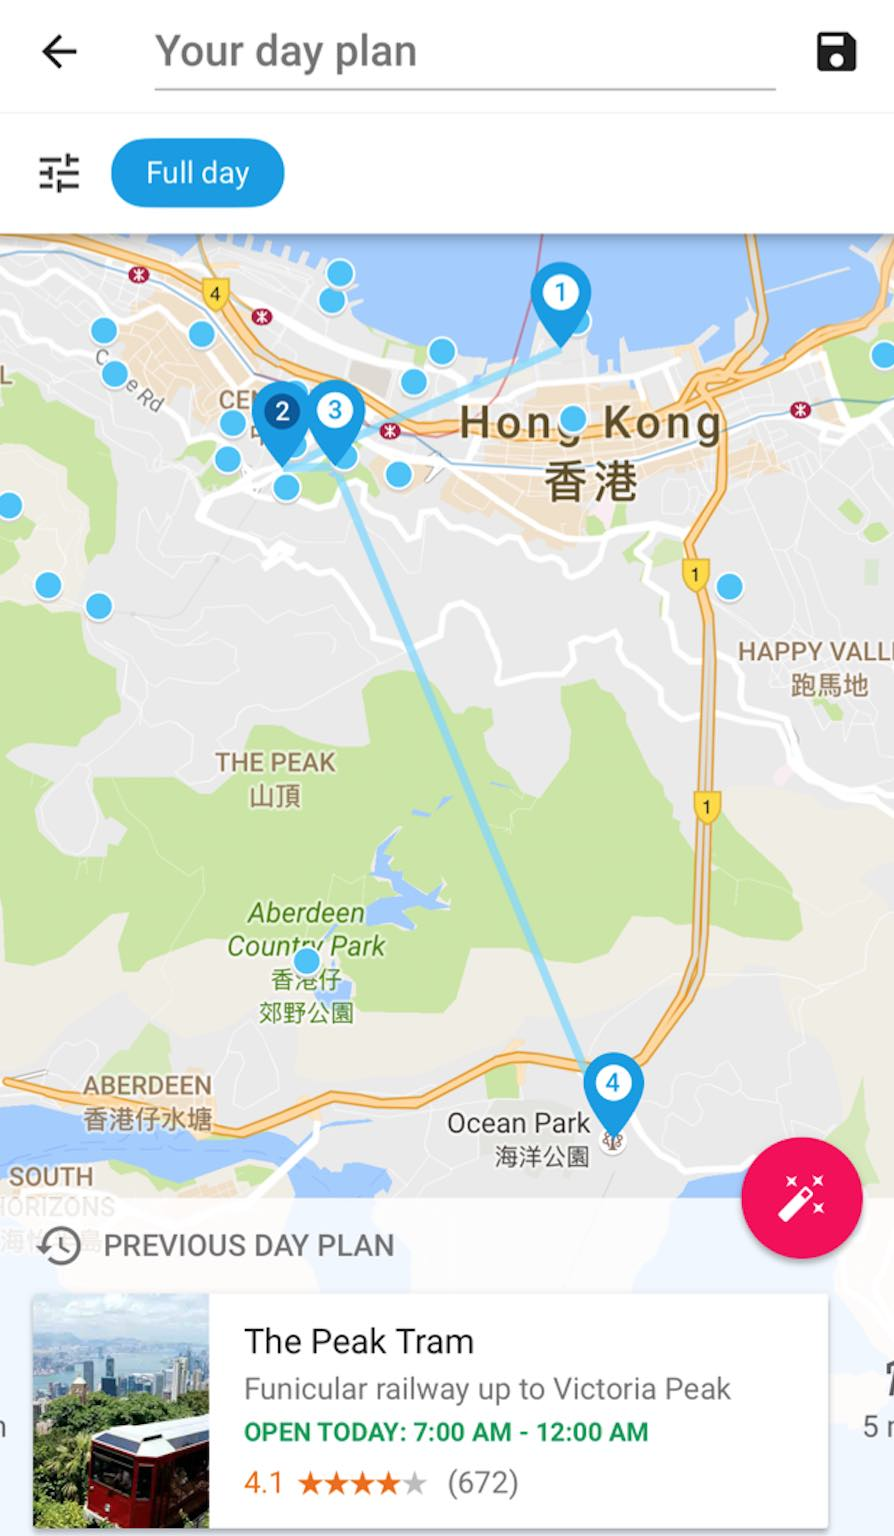 google-trips-magic-wane-aspirantsg